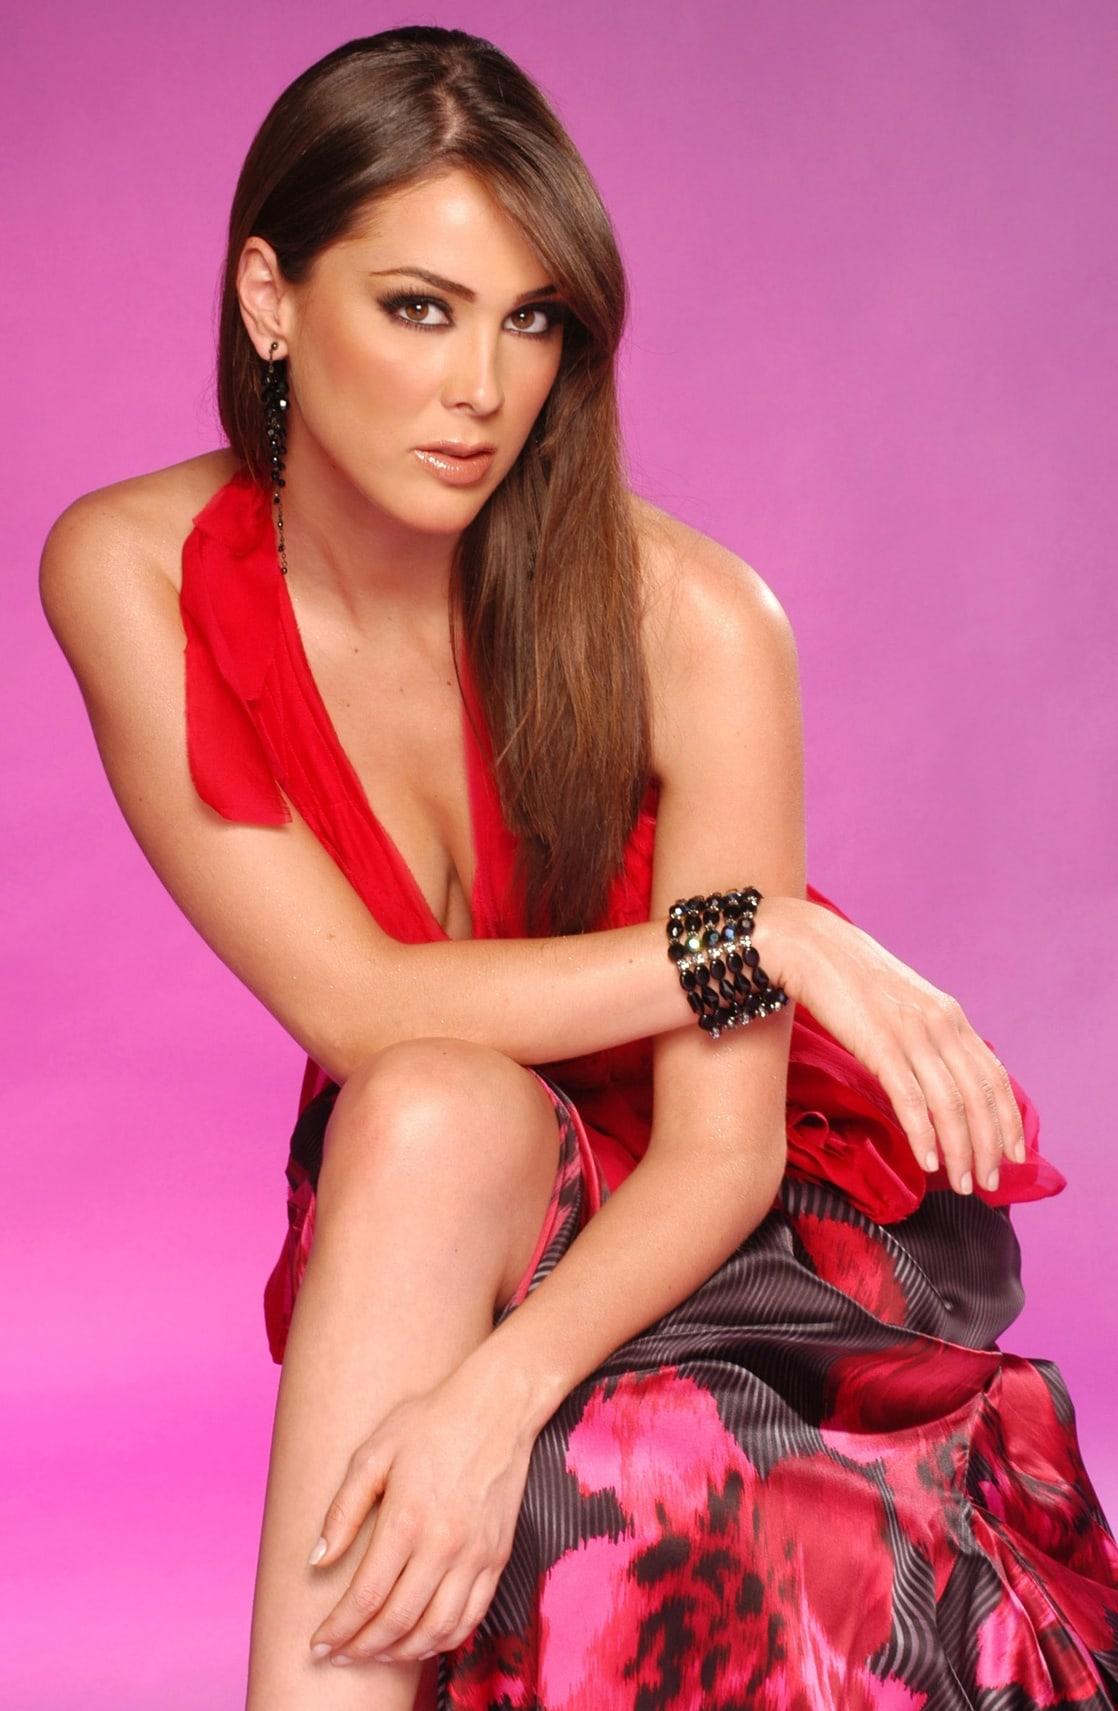 Jacqueline Bracamontes Nude Photos 14